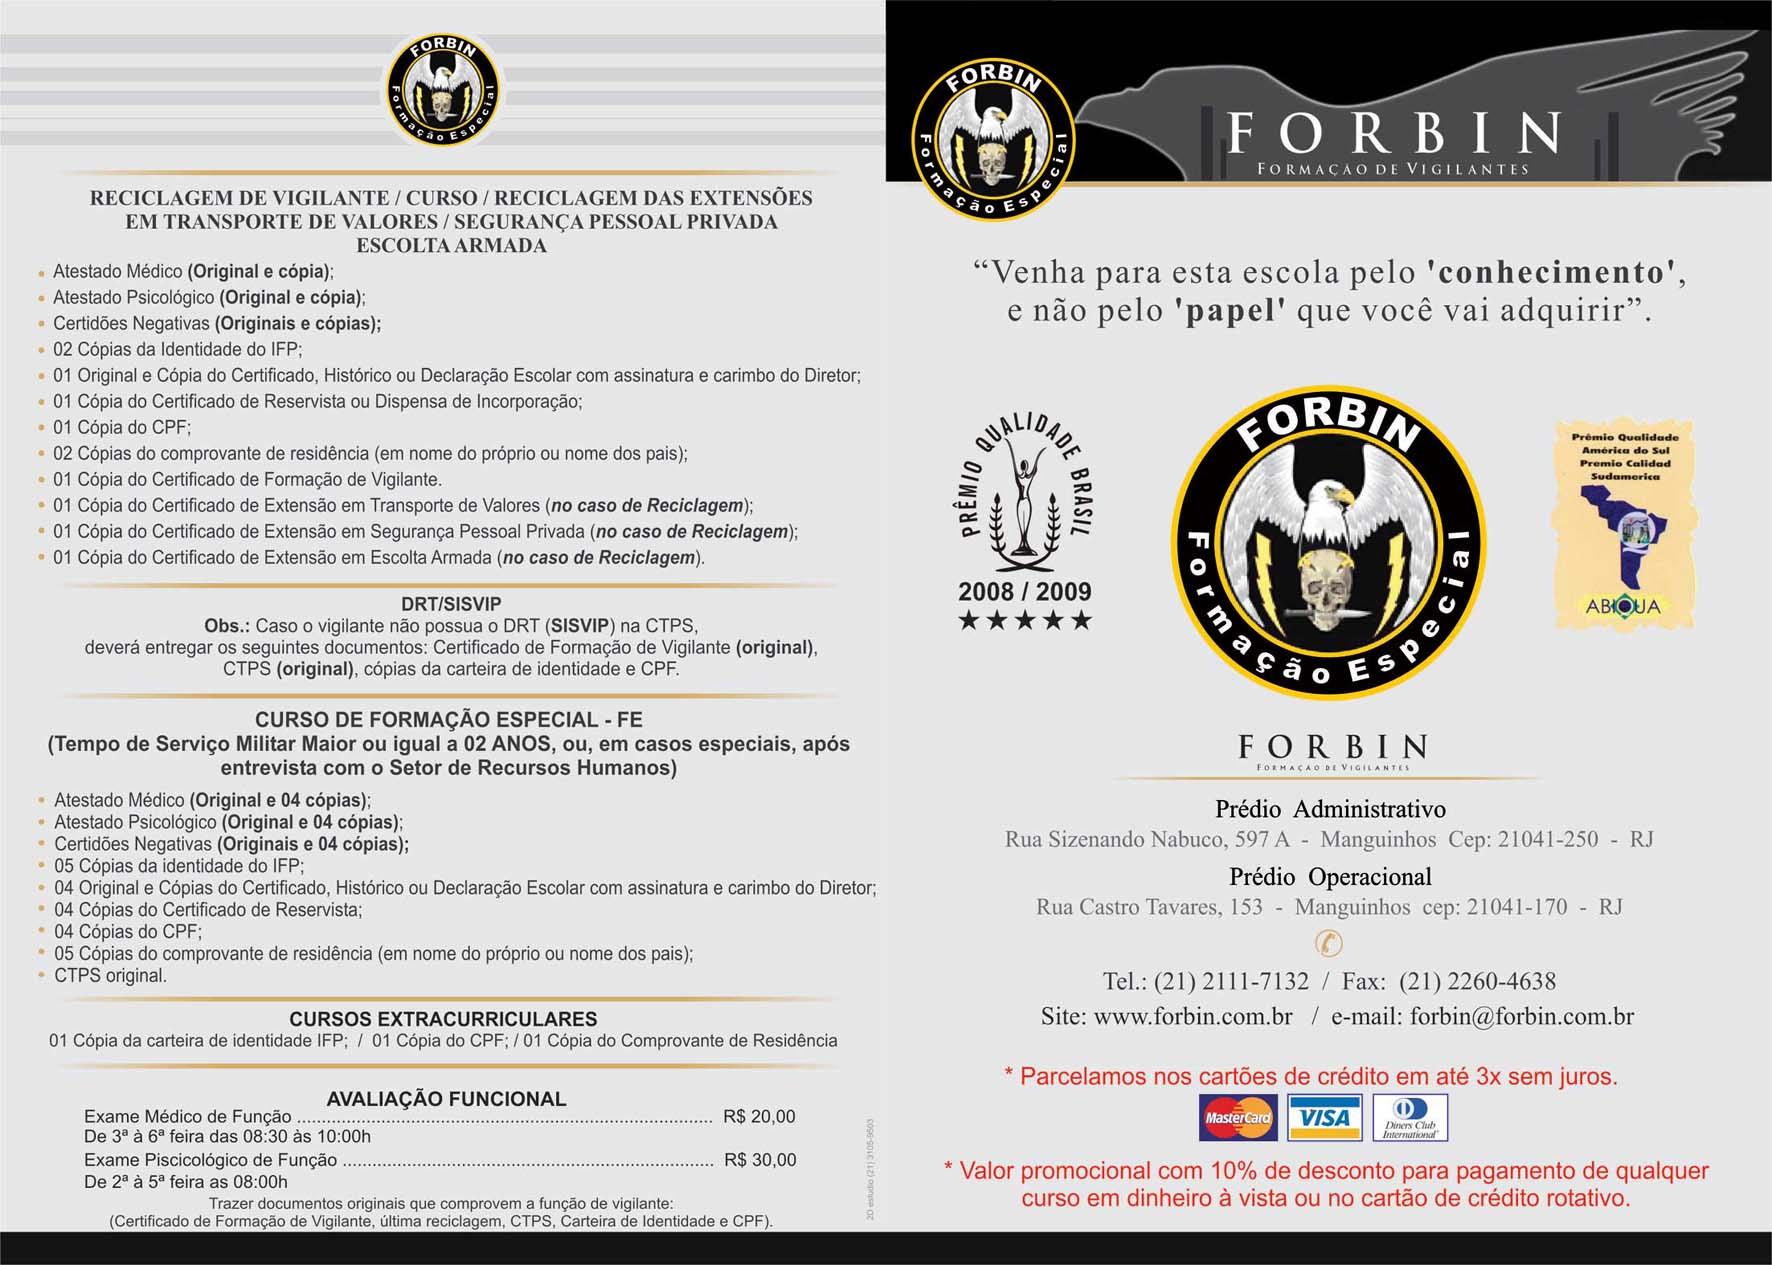 panfleto-FORBIM-externo-20,